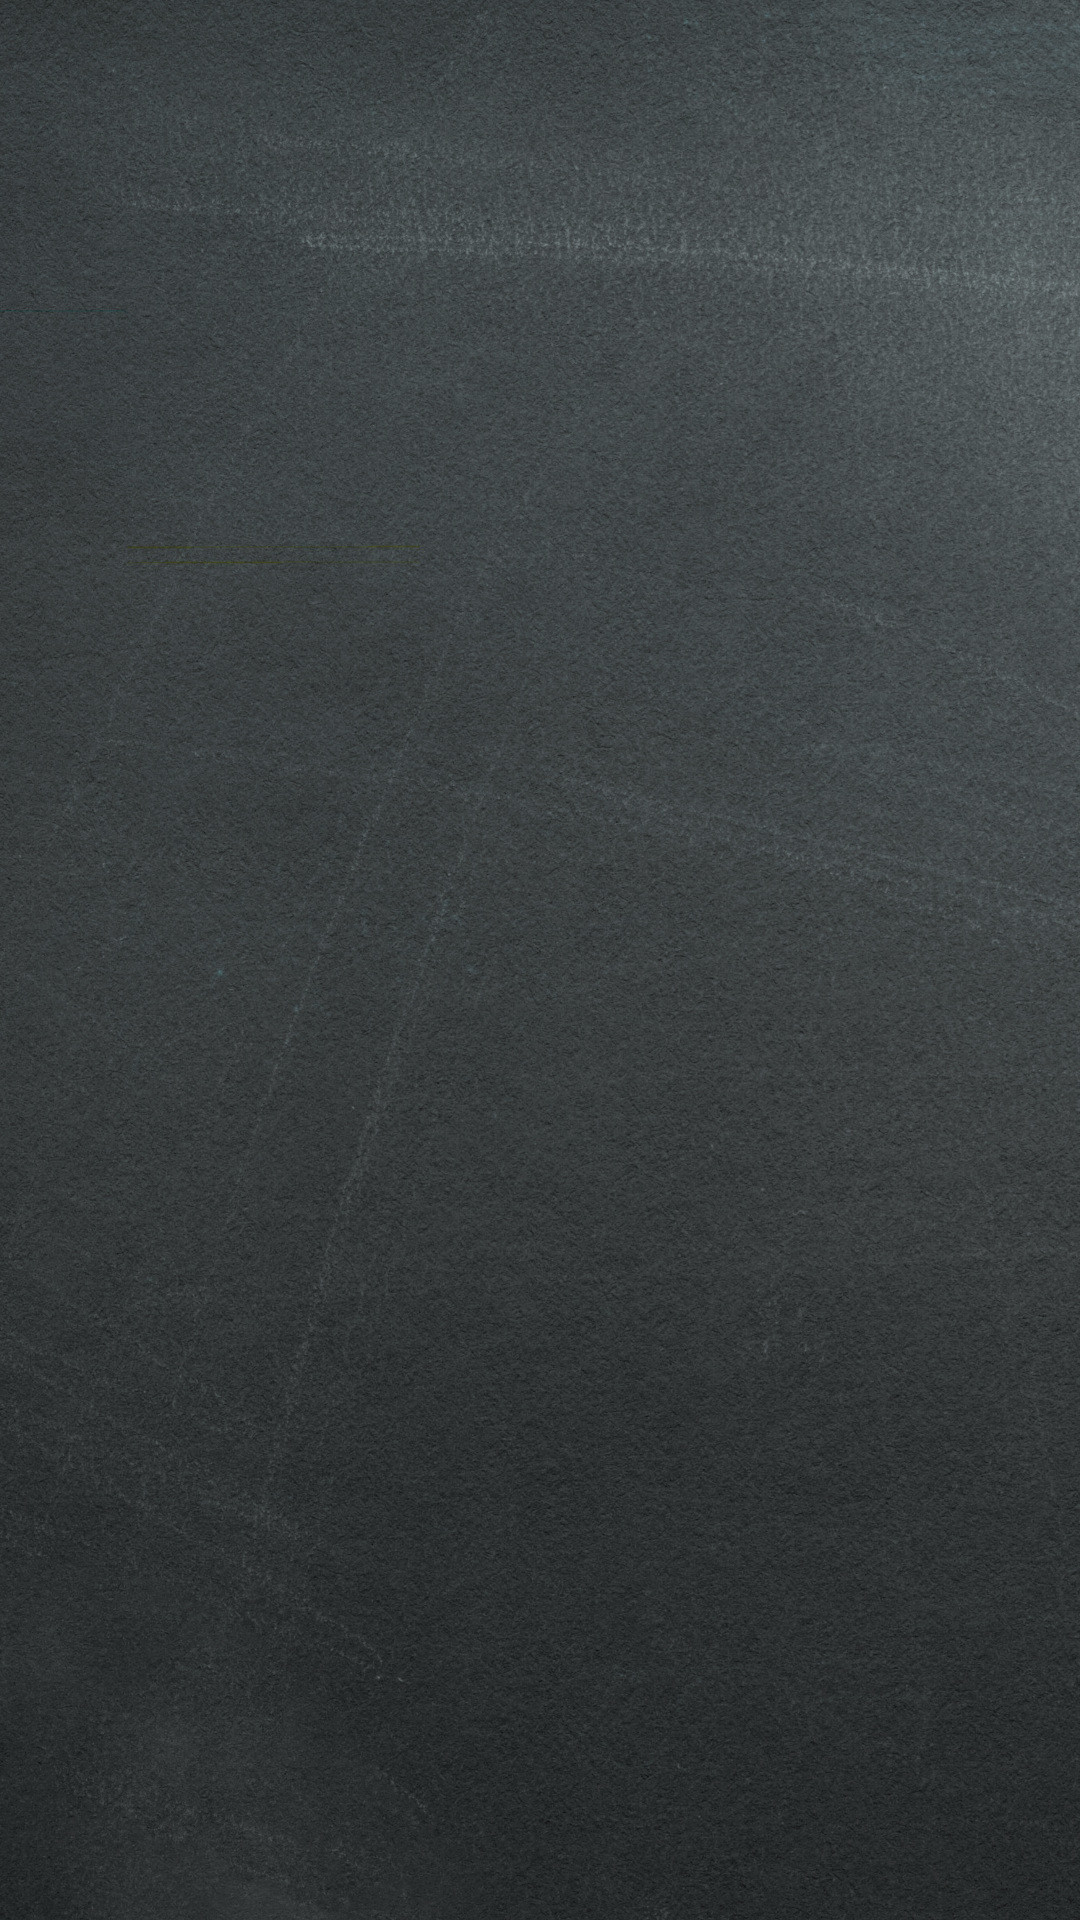 blackboard-1920.jpg